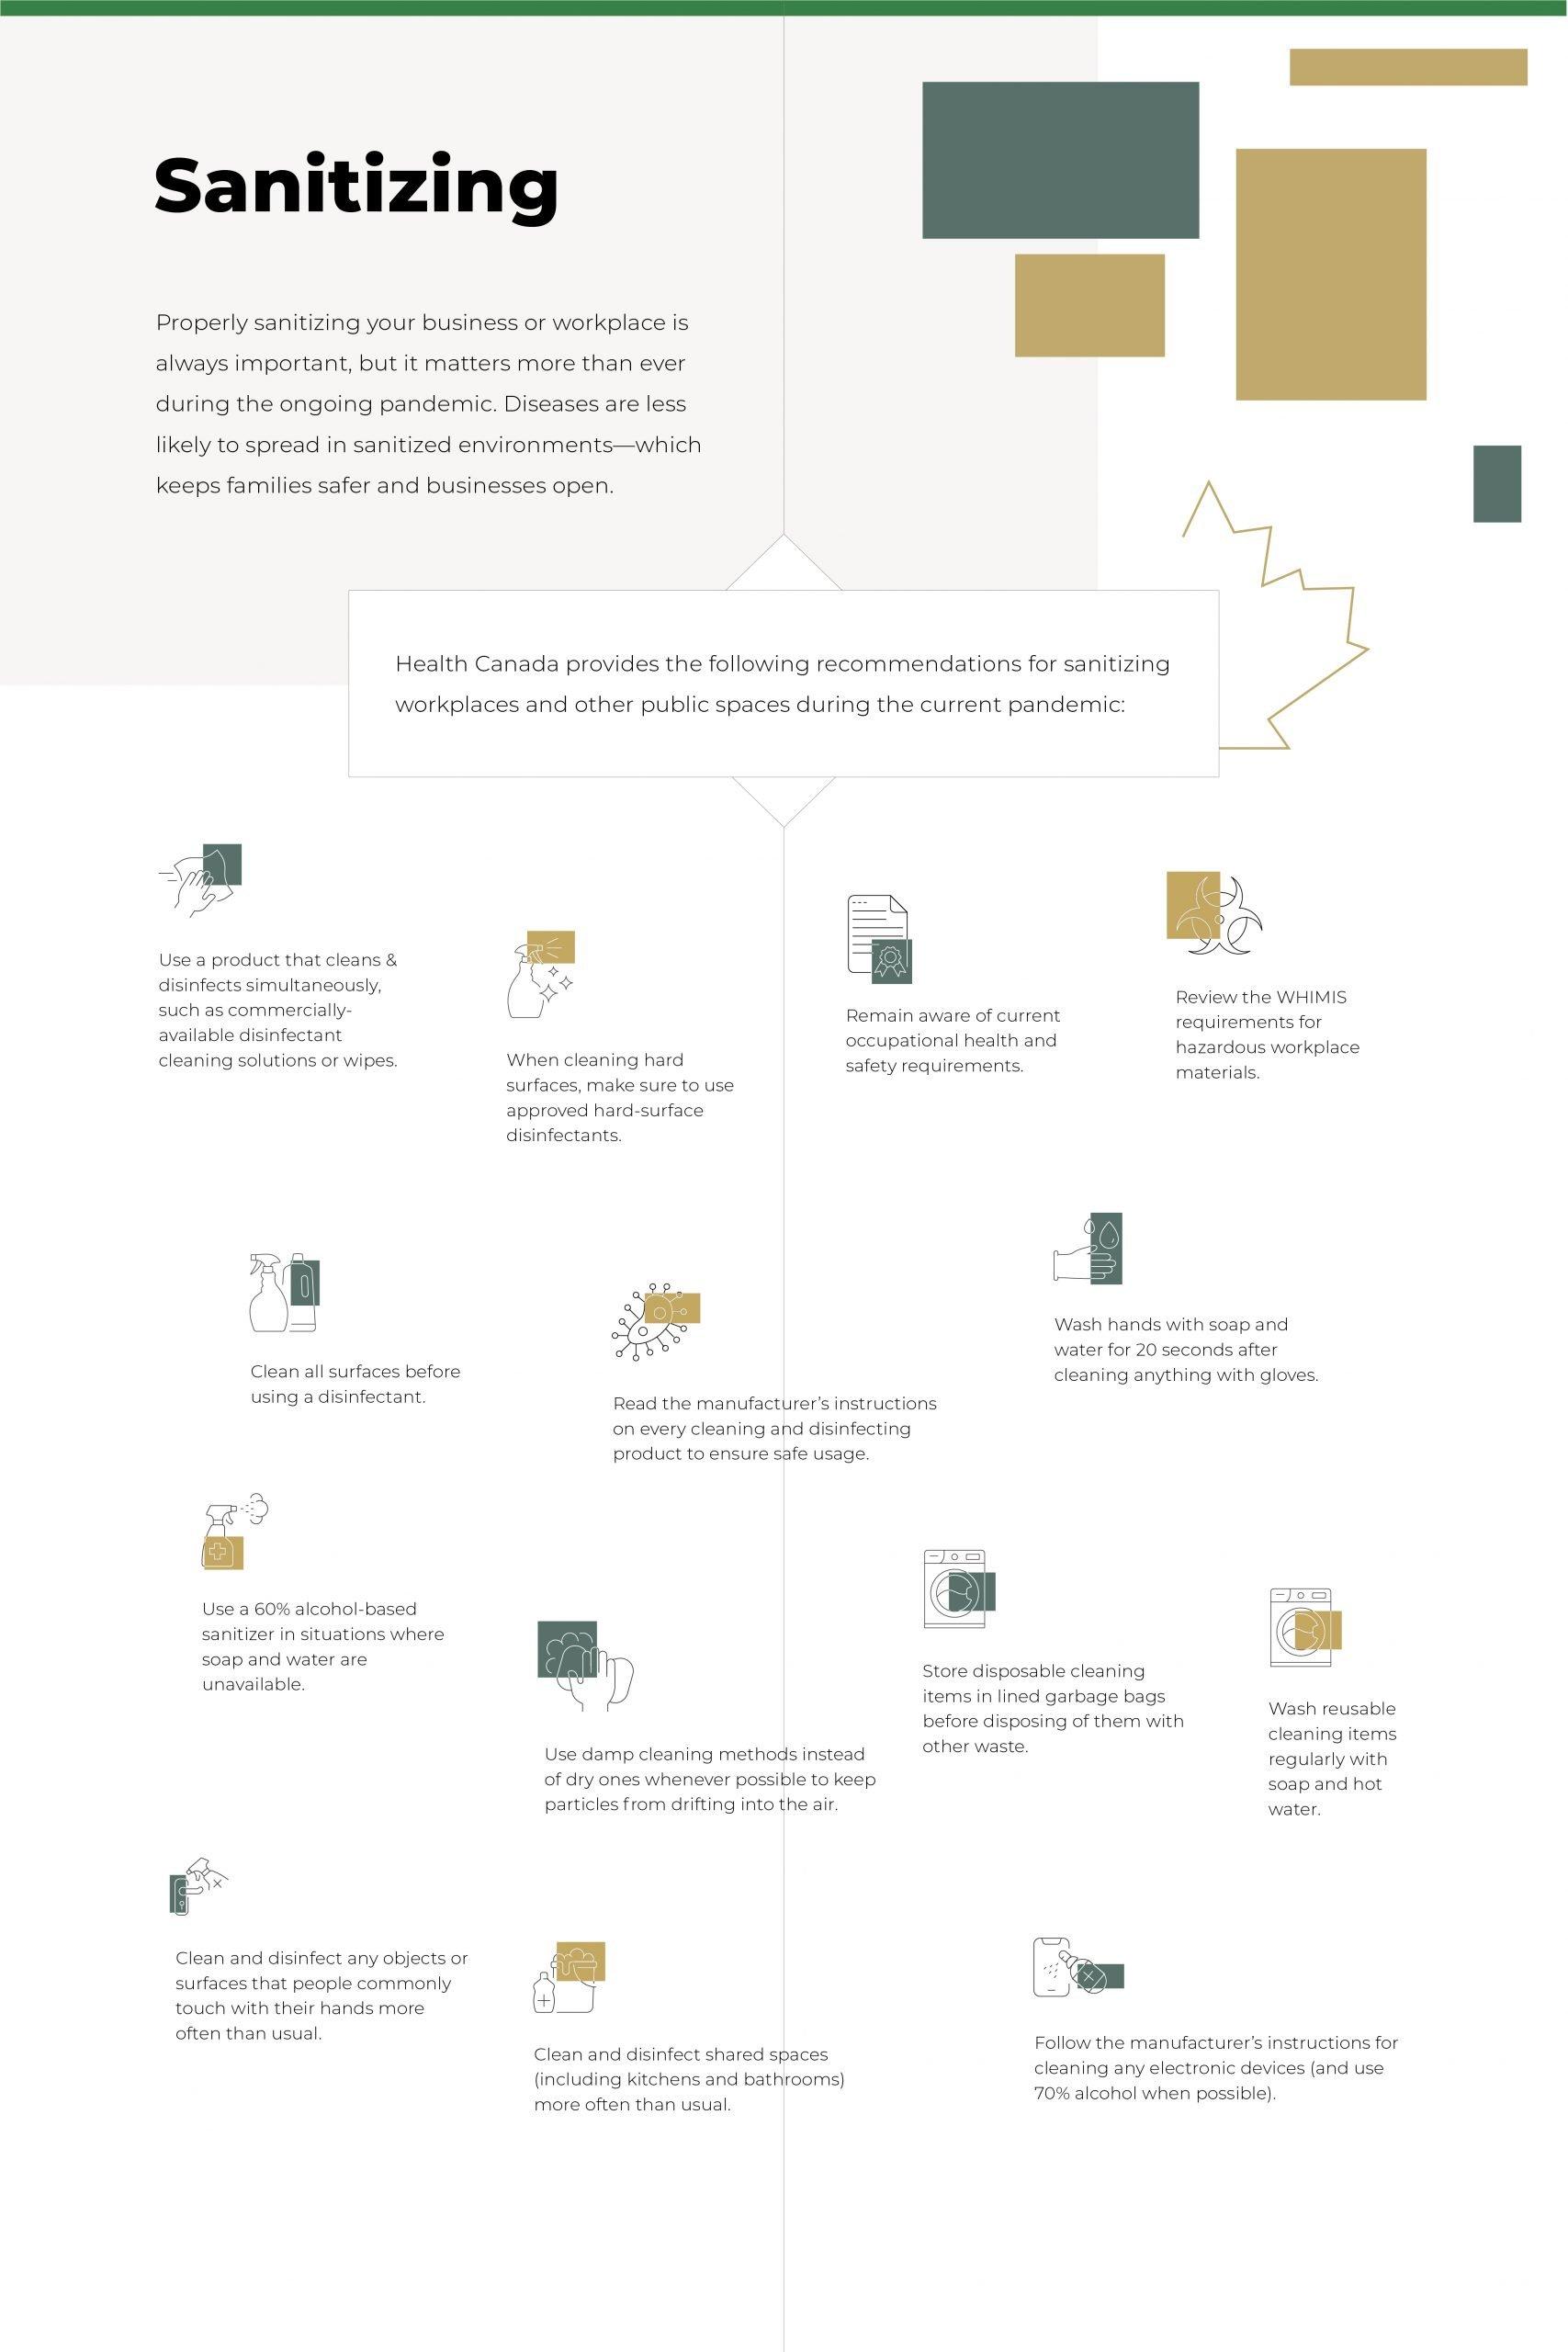 Sanitizing infographic